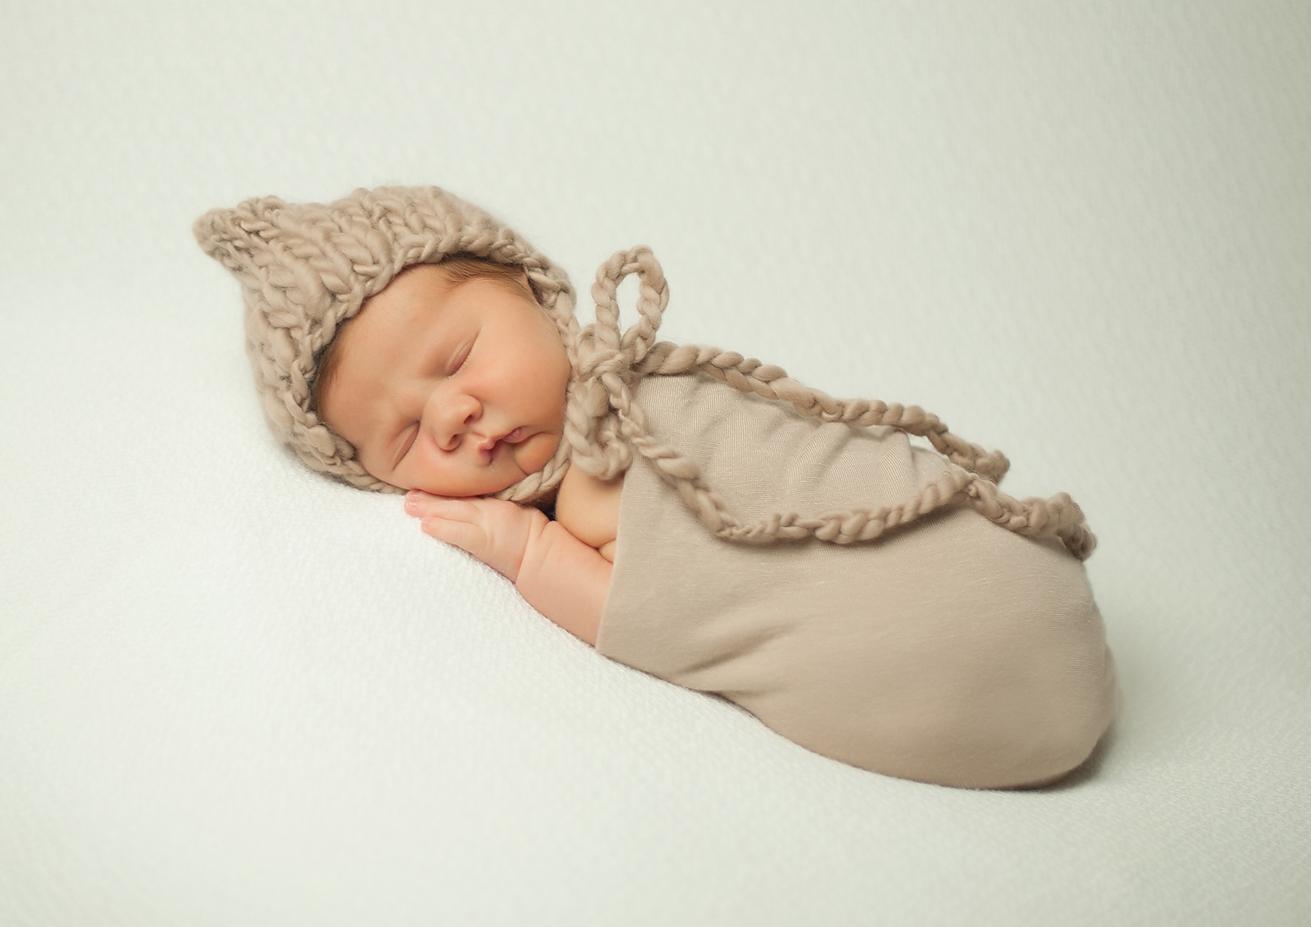 newborn photography hihg point north carolina sleeping baby in bonnet on cream blanket .jpg